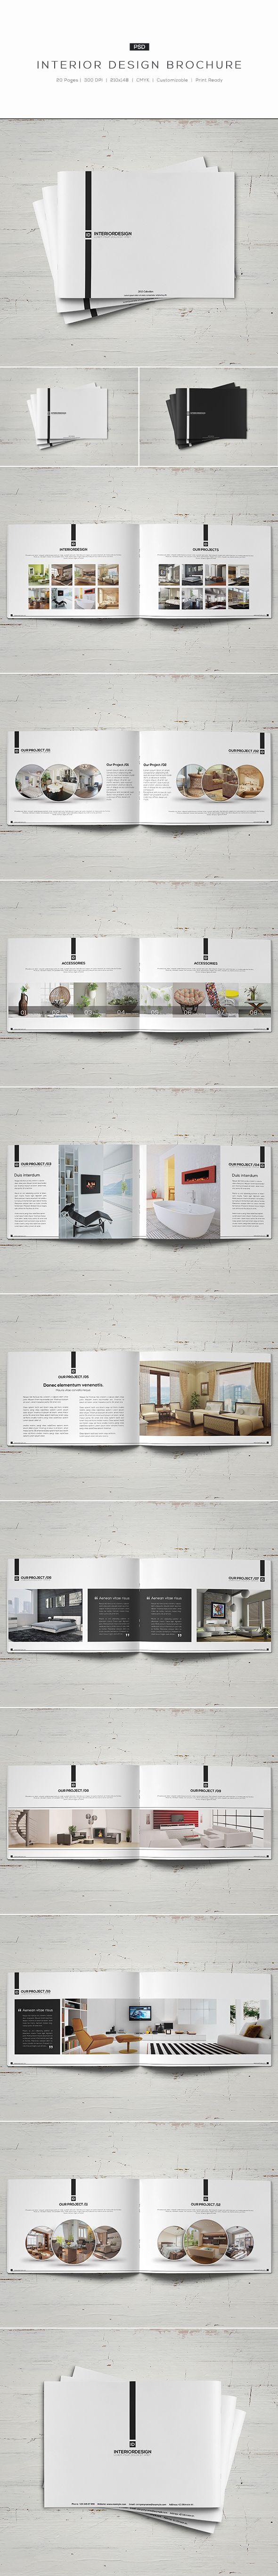 Interior Design Brochure2 Different Colors:- White- BlackDetails:- 20 pages- Easy to modify- CMYK- 300 DPI- 210mm x 148mm- Print ready- Layered PSDFonts:fontfabric.com/nexa-free-fontgoogle.com/fonts/specimen/Open+Sansgoogle.com/font…